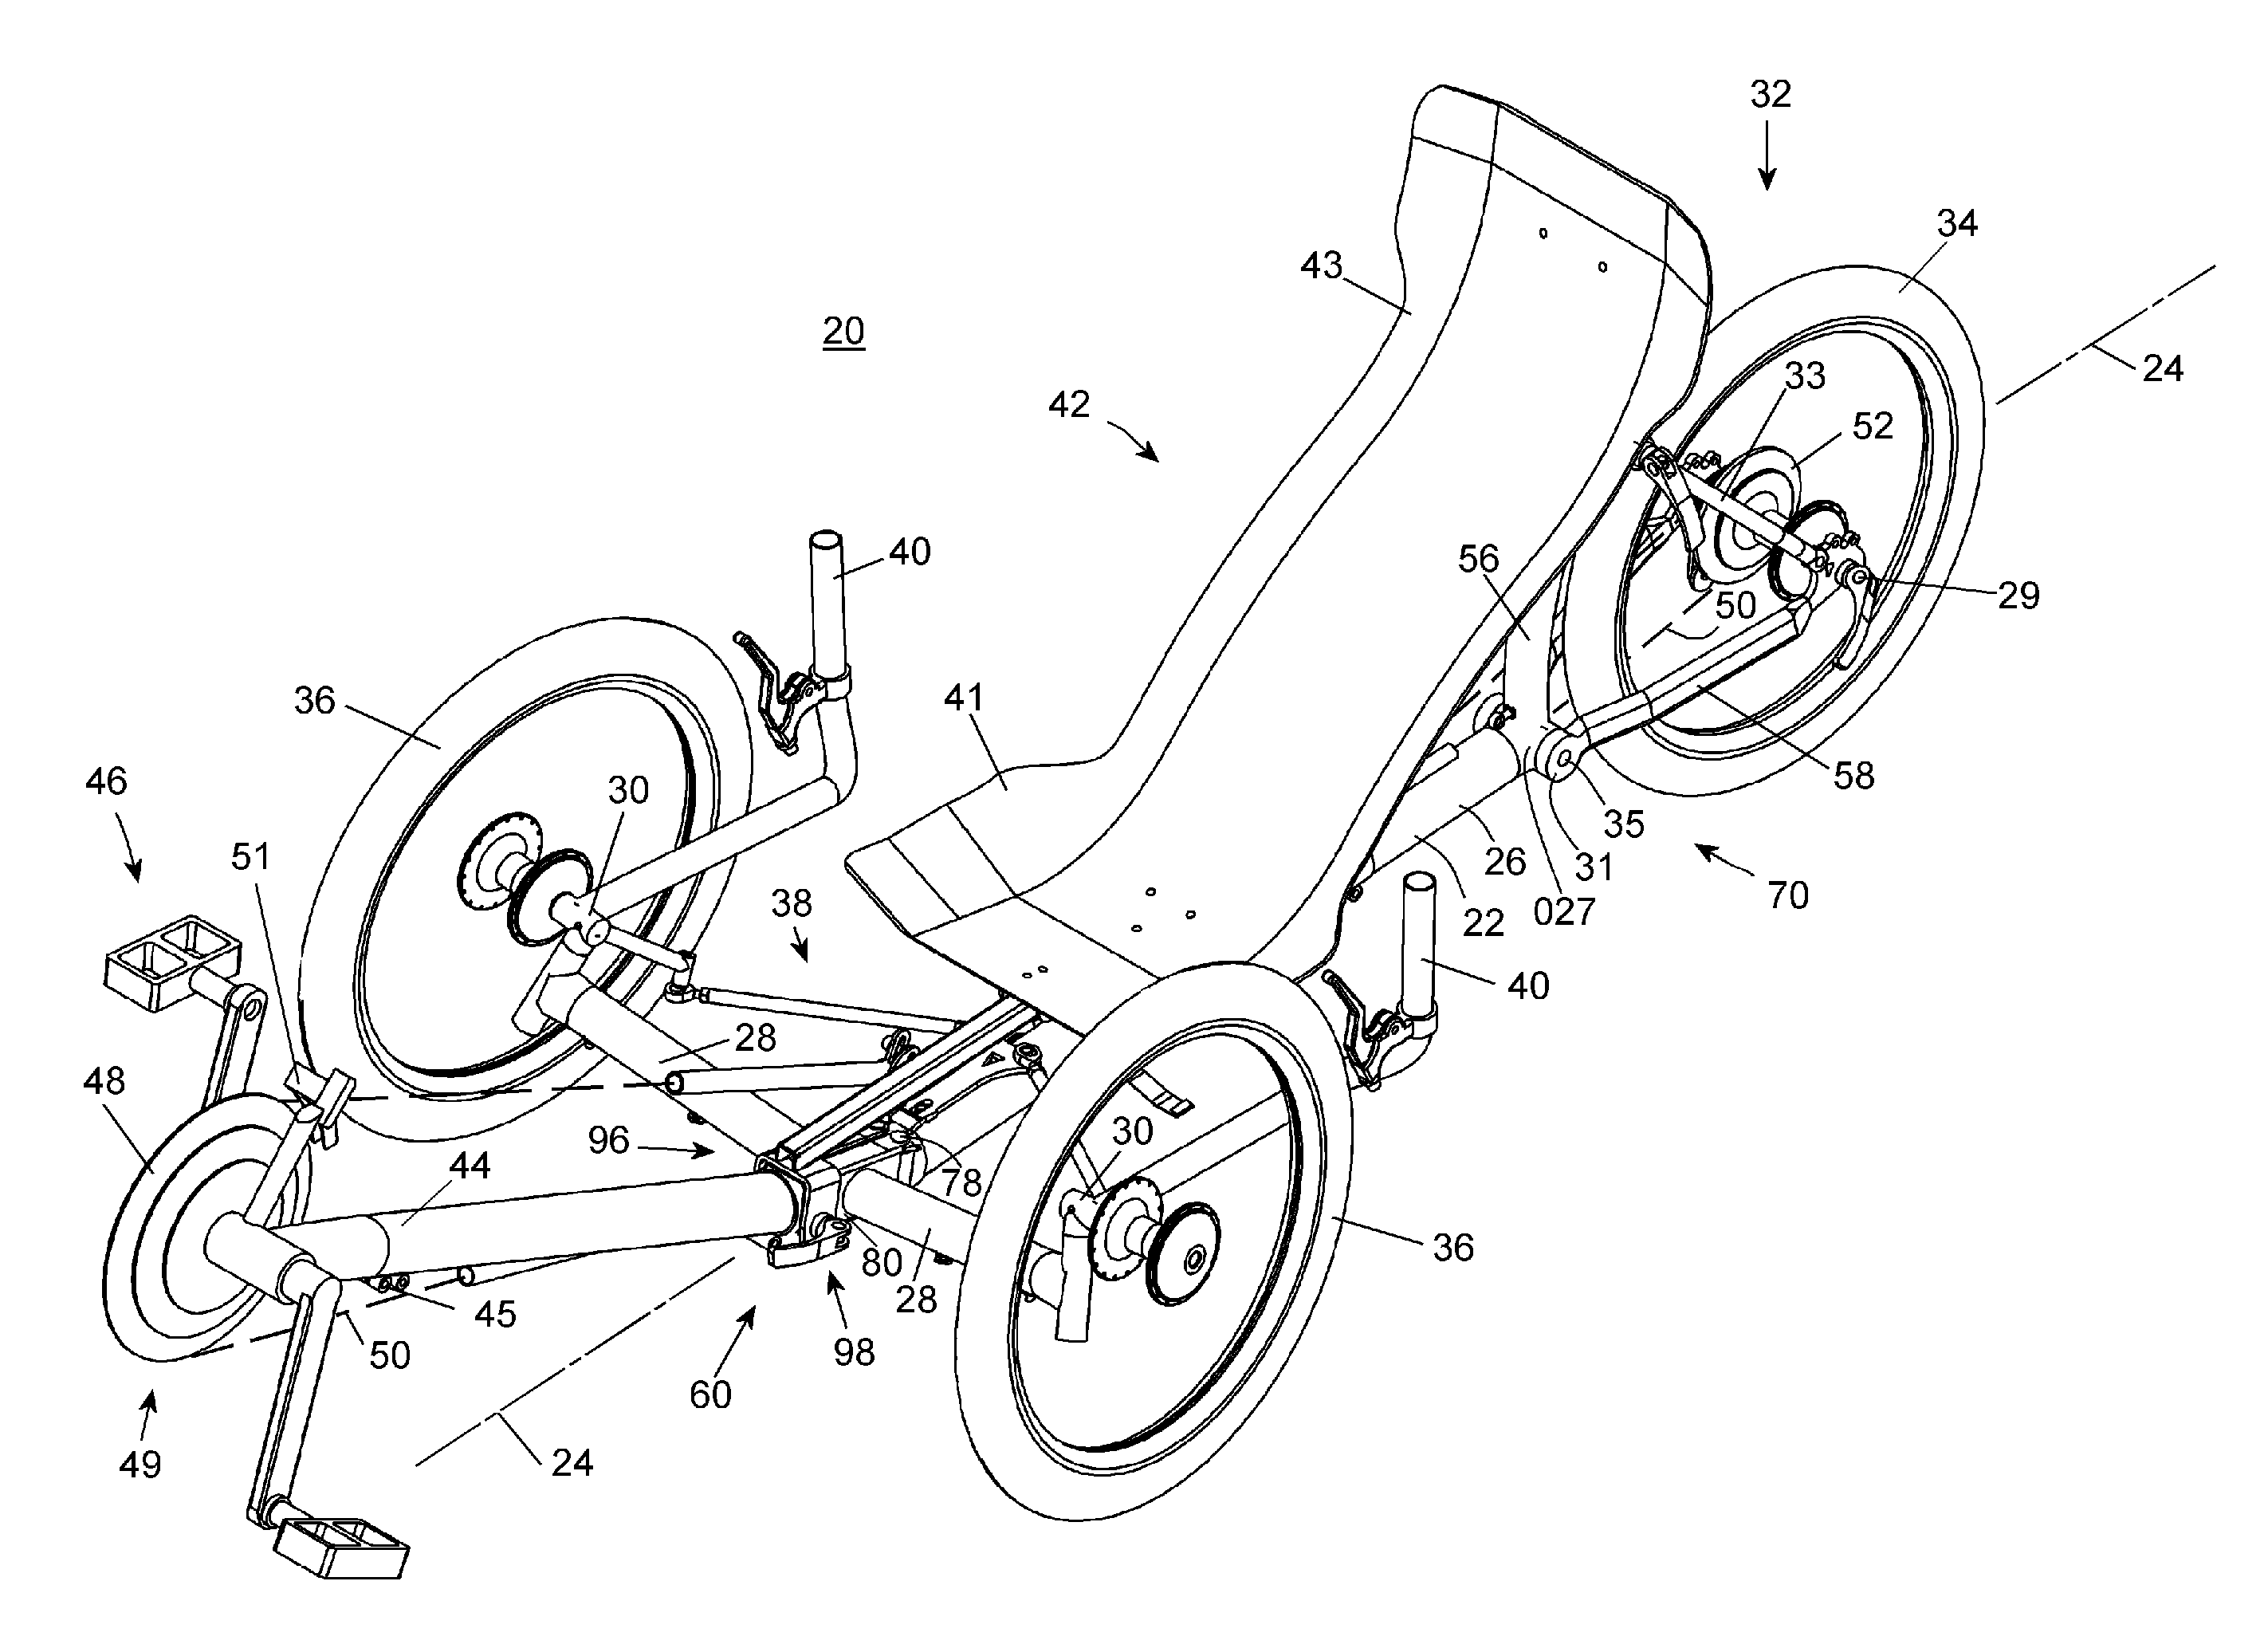 Easy Recumbent Bike Plan